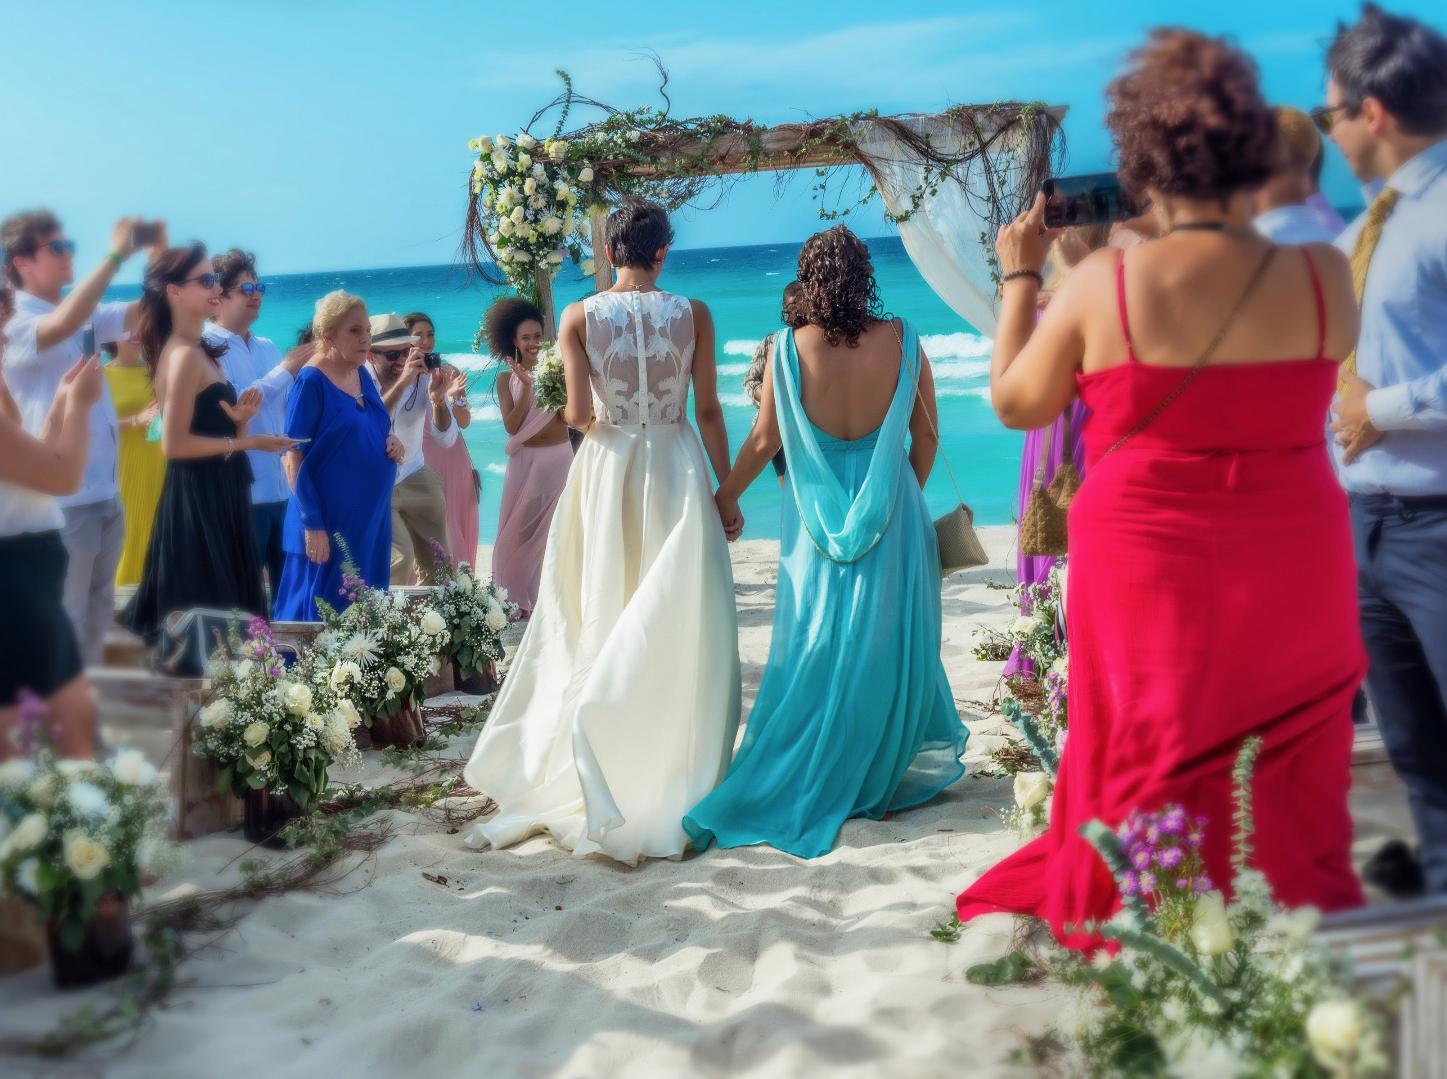 Wedding in Varadero (The Guests) dia 4